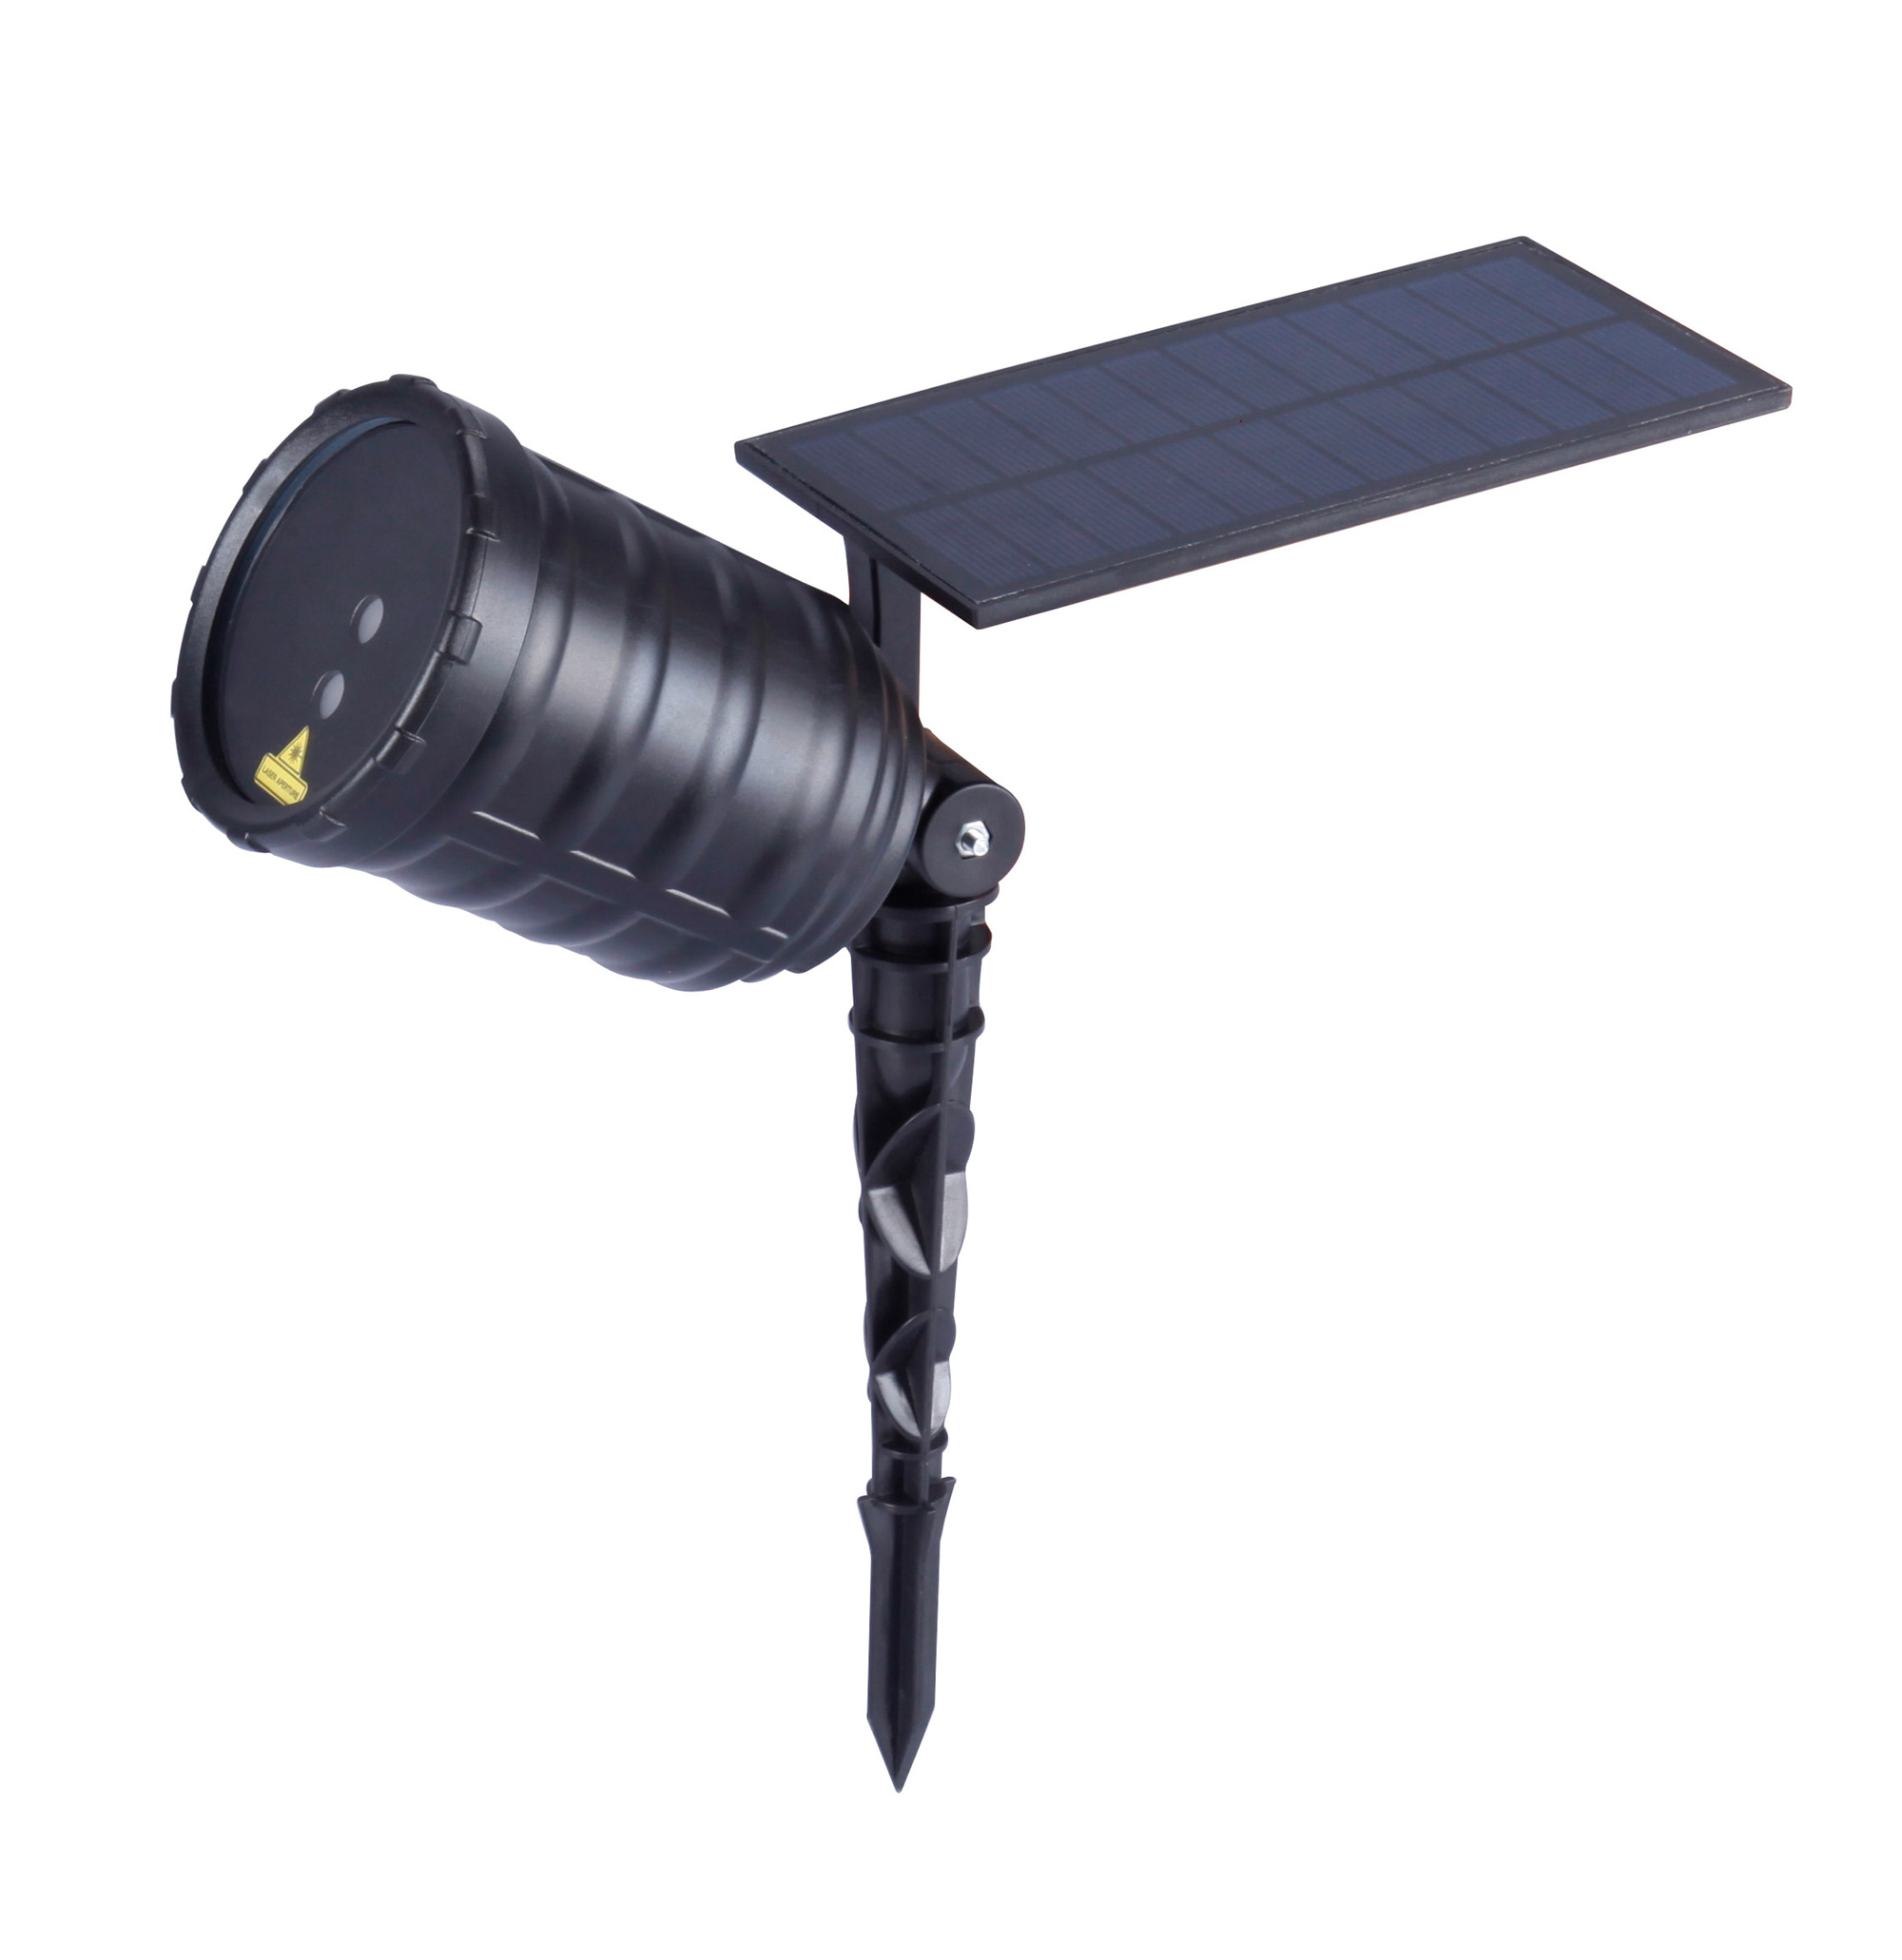 Ultron 239697 - Außen-Bodenbeleuchtung - Schwarz - IP65 - Garten - Solar - 8 h